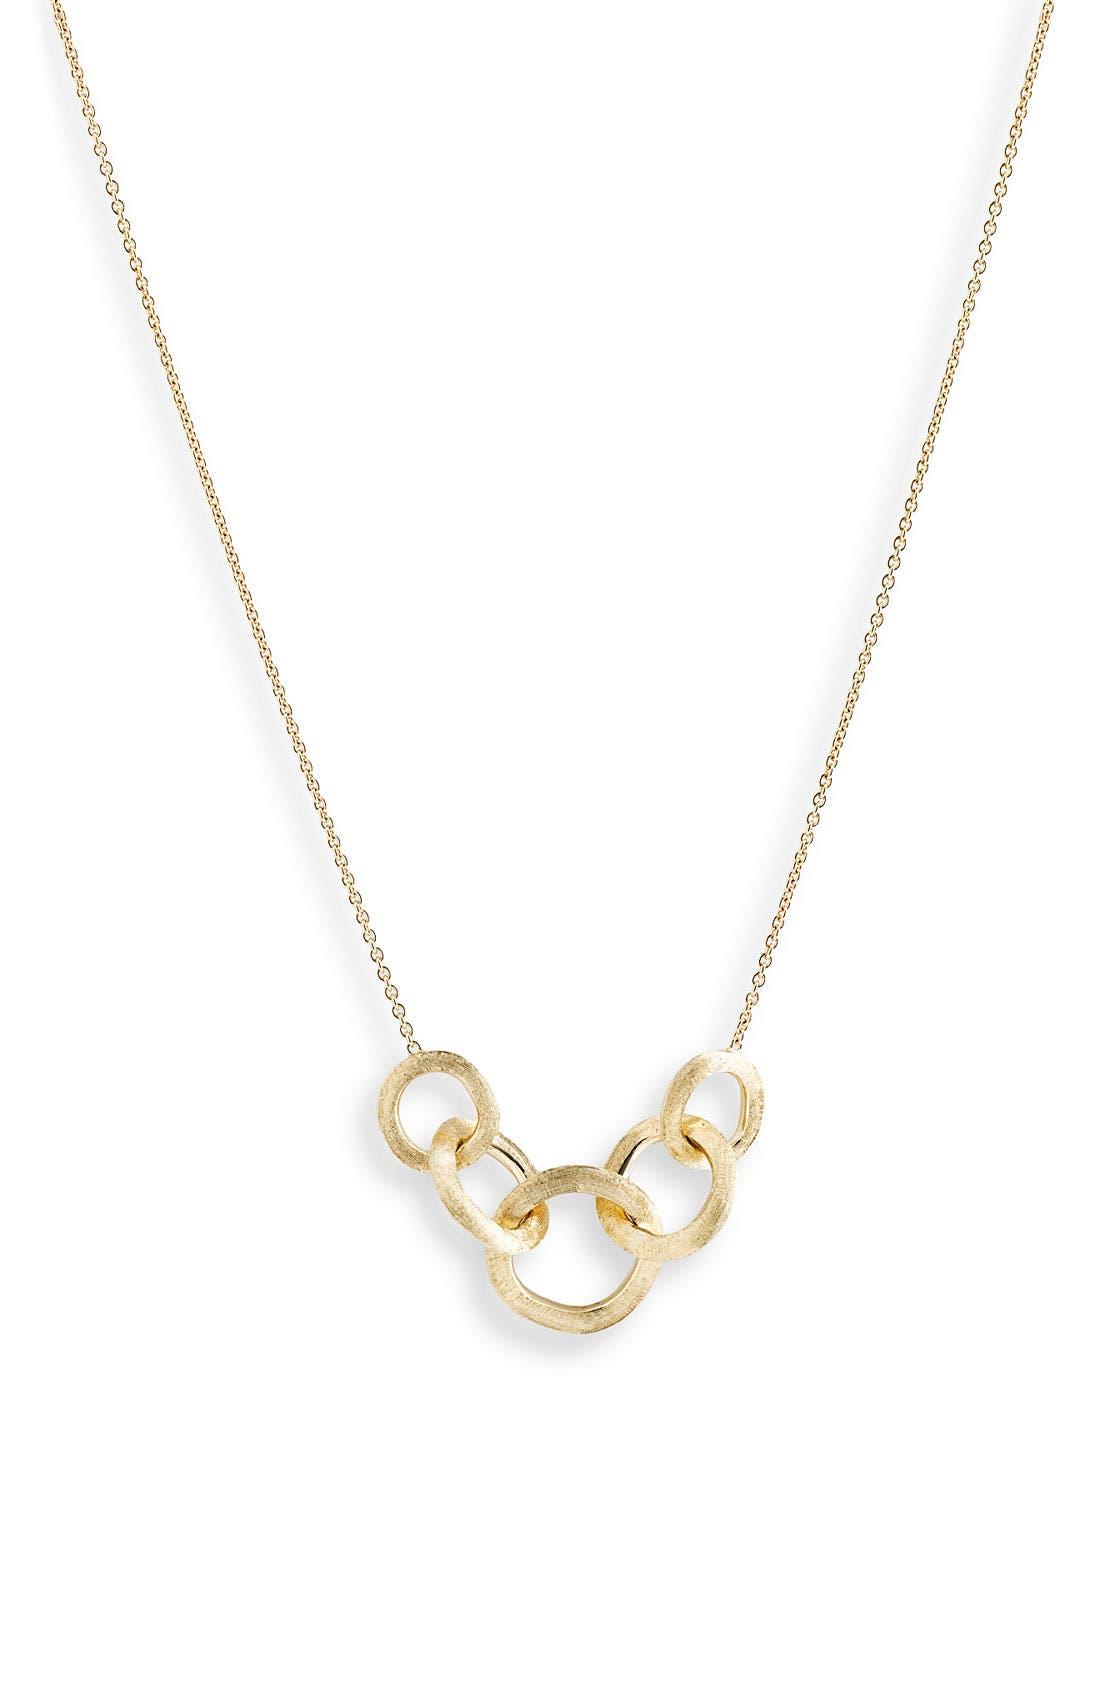 Alternate Image 1 Selected - Marco Bicego 'Jaipur' Link Necklace